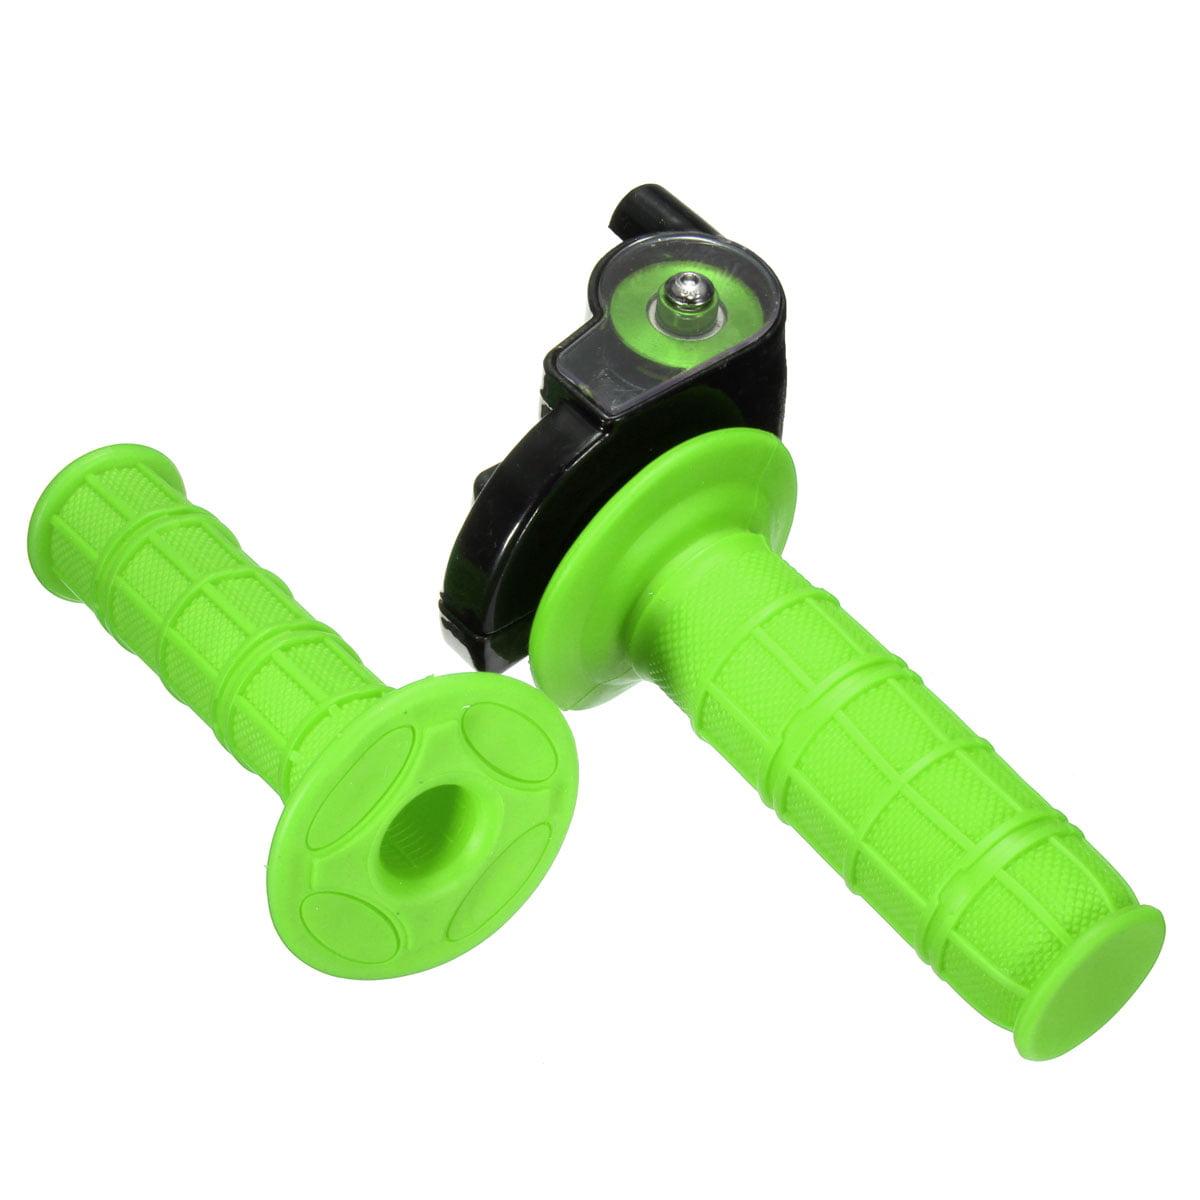 "MATCC Quick Action Throttle Grip Twist Cable For 90 110 125cc ATV Pit Dirt Bike 22mm handgrips 7/8"" Handlebar Green"